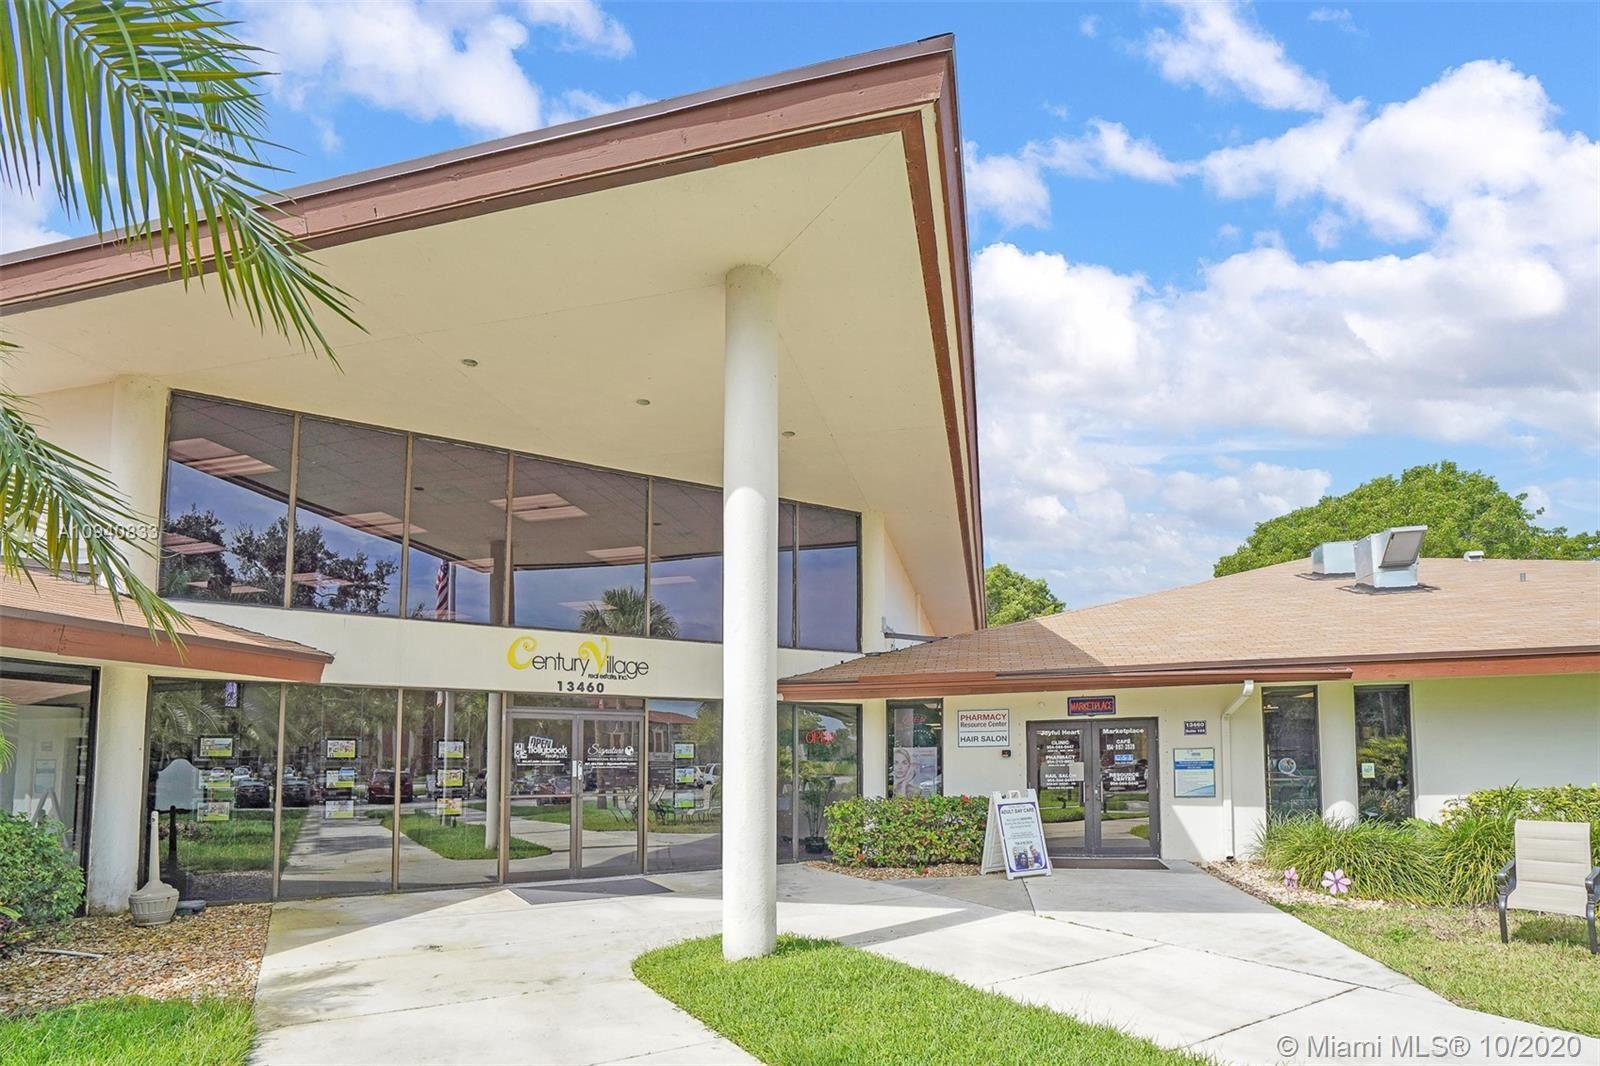 1351 SW 125th Ave #414S, Pembroke Pines, FL 33027 - #: A10940833